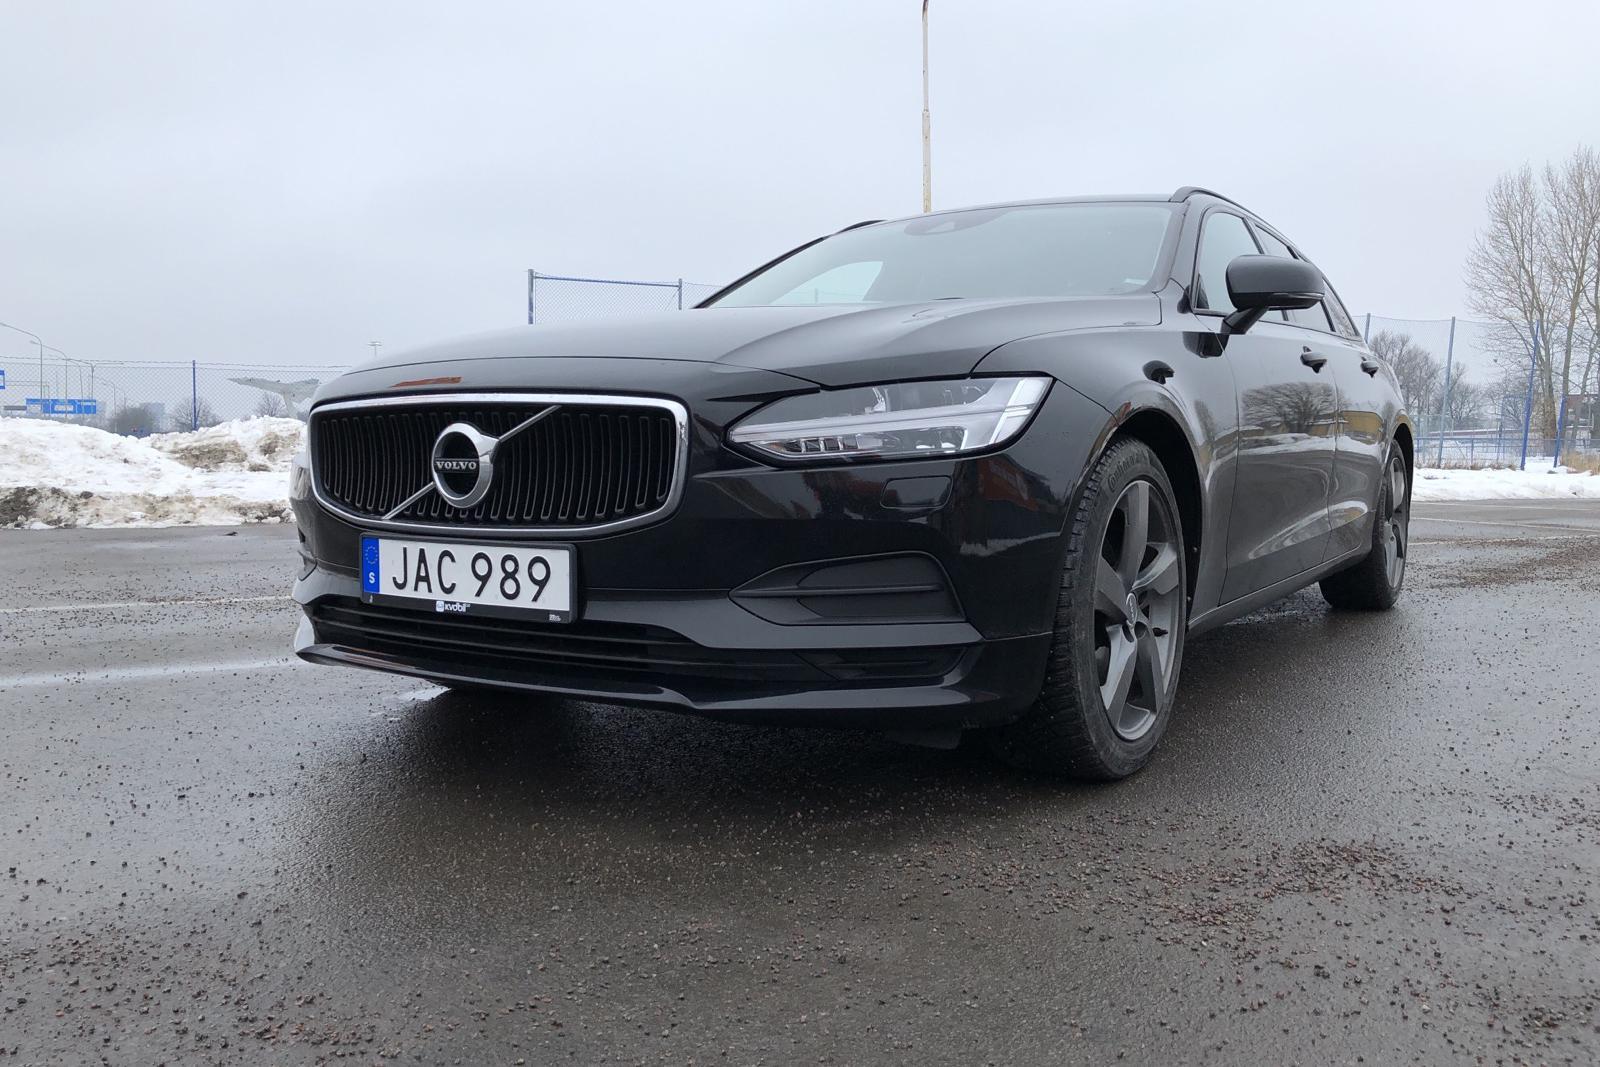 Volvo V90 D4 (190hk) - 100 640 km - Automatic - black - 2018